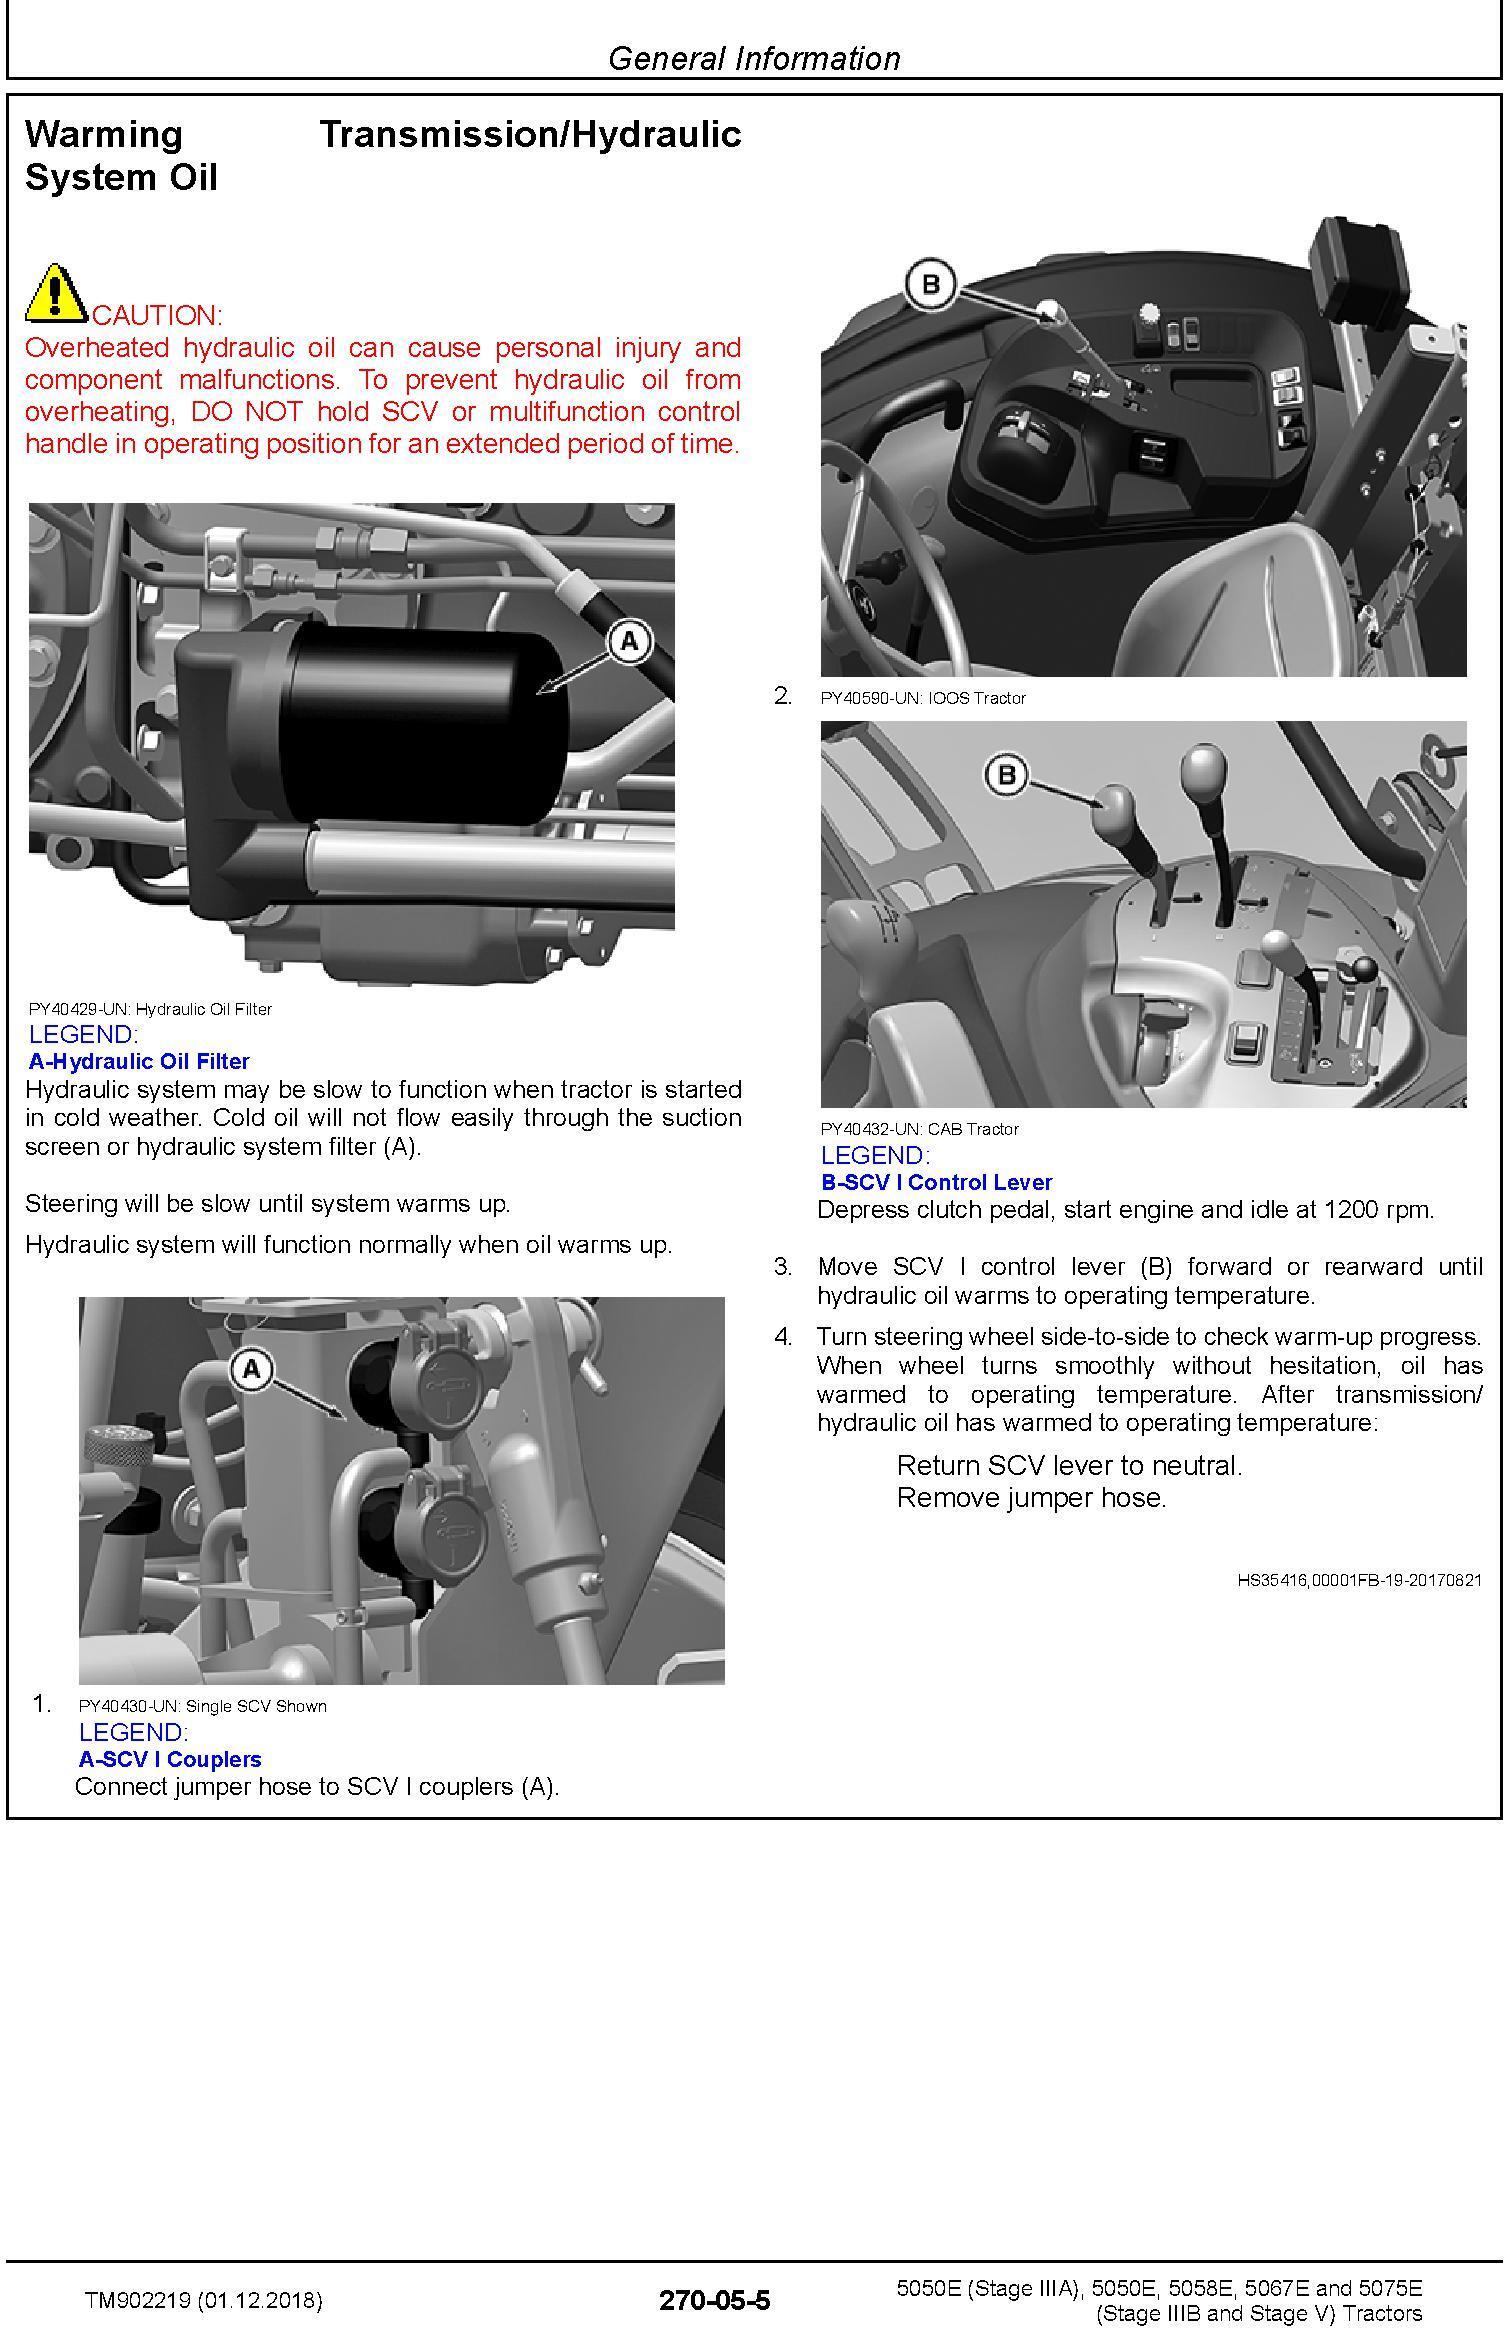 John Deere 5050E, 5050E, 5058E, 5067E, 5075E Tractors Diagnostic Technical Service Manual (TM902219) - 2